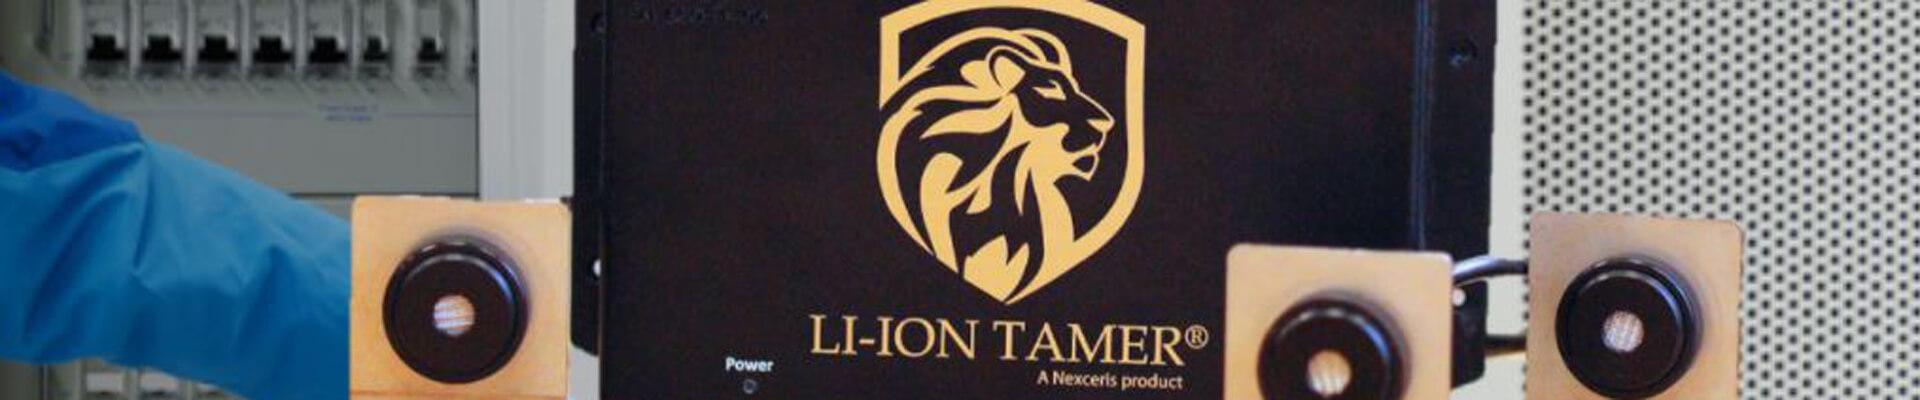 Banner_Li-ion_Tamer1940x400